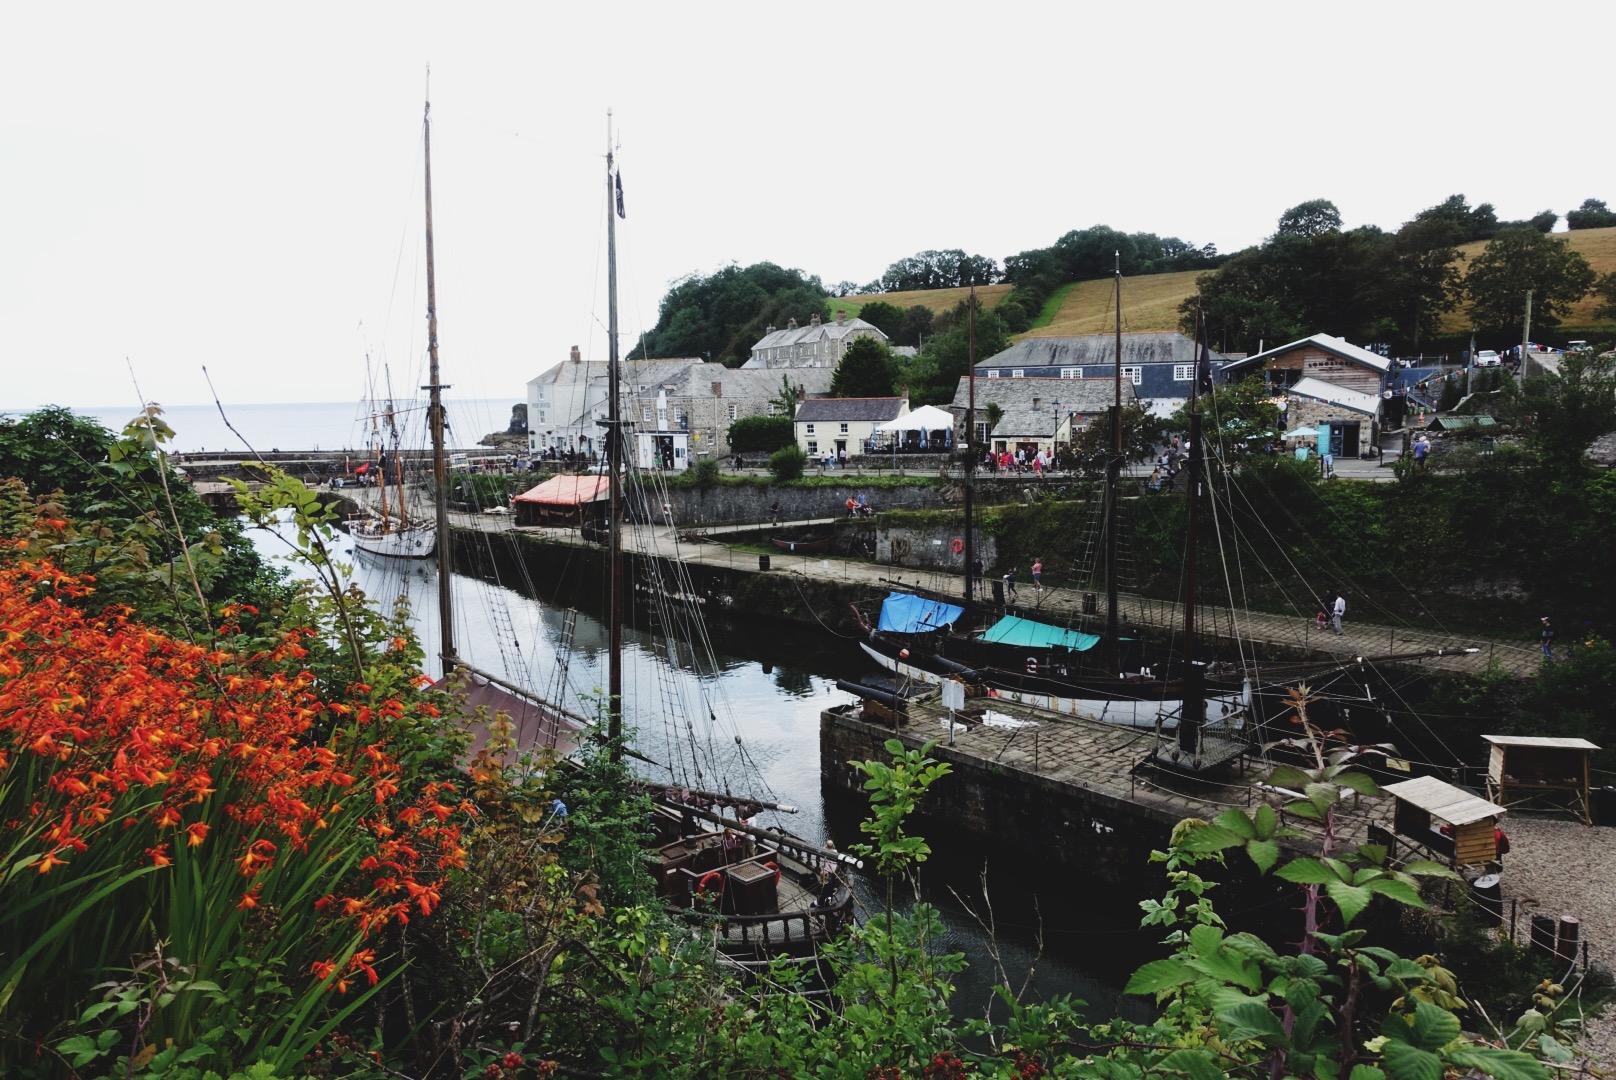 The village of    Charlestown   , Cornwall.